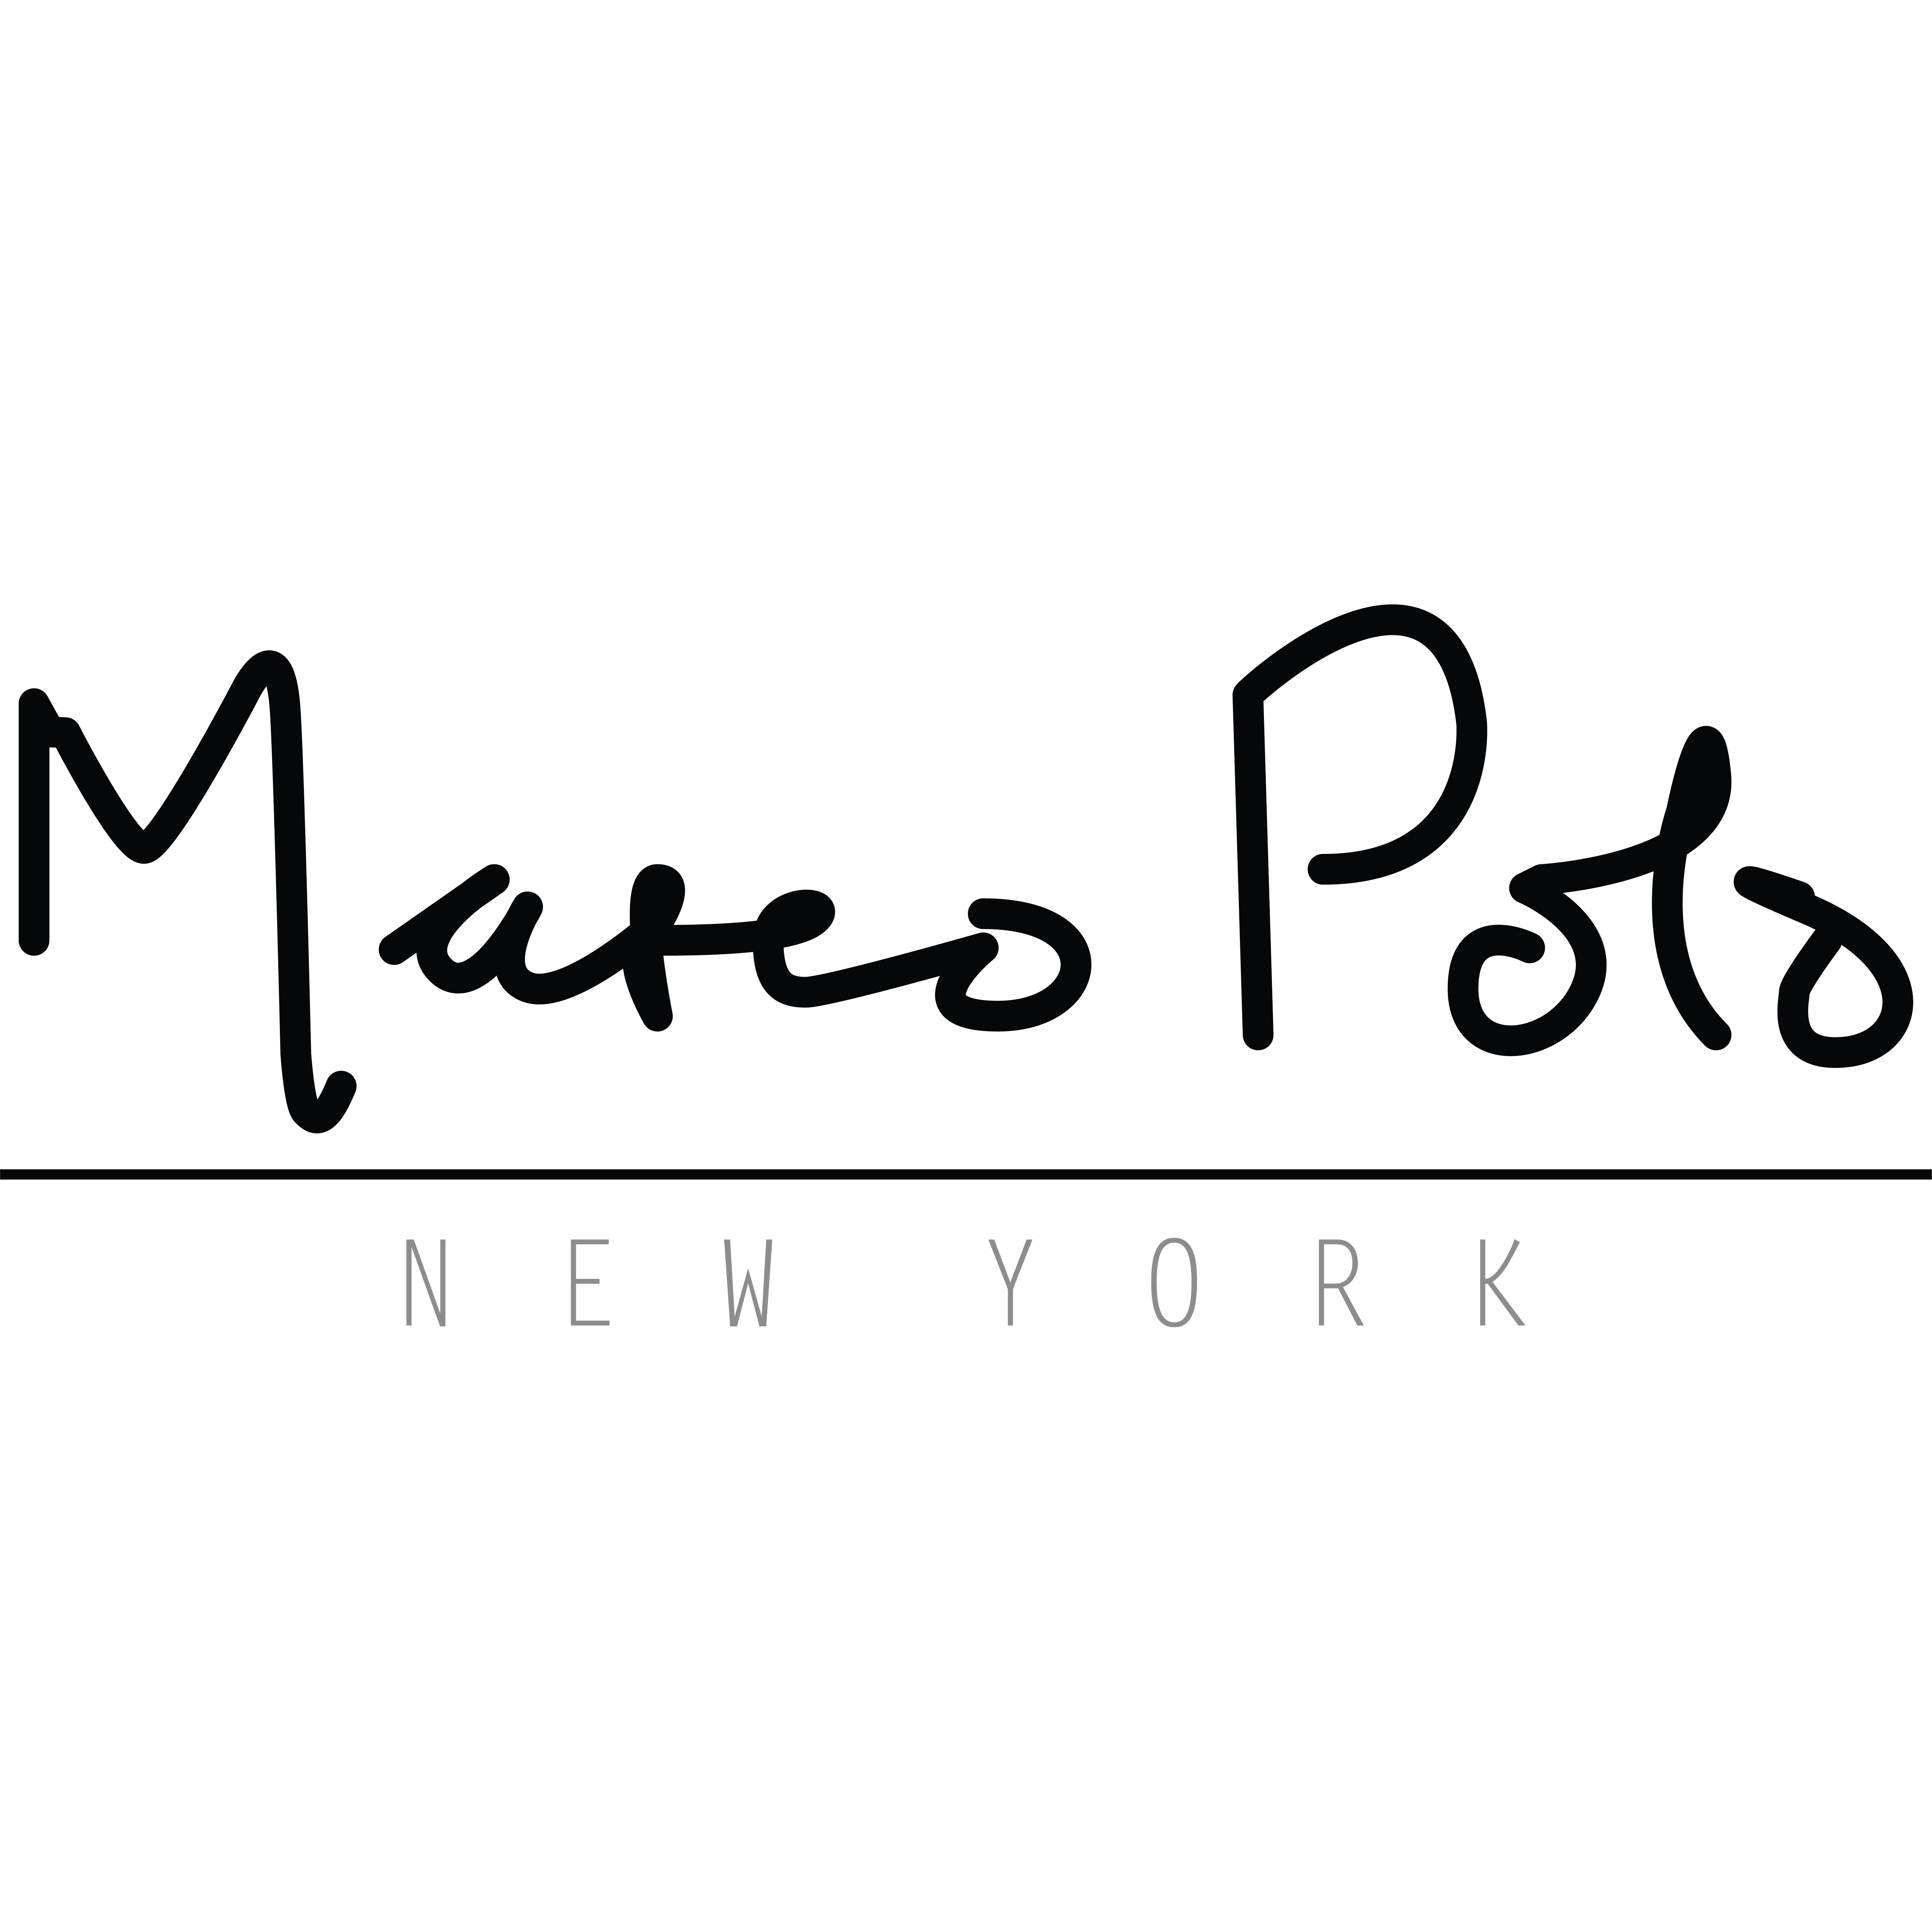 Marco Polo Shoes - Brooklyn, NY 11222 - (718)349-6644 | ShowMeLocal.com